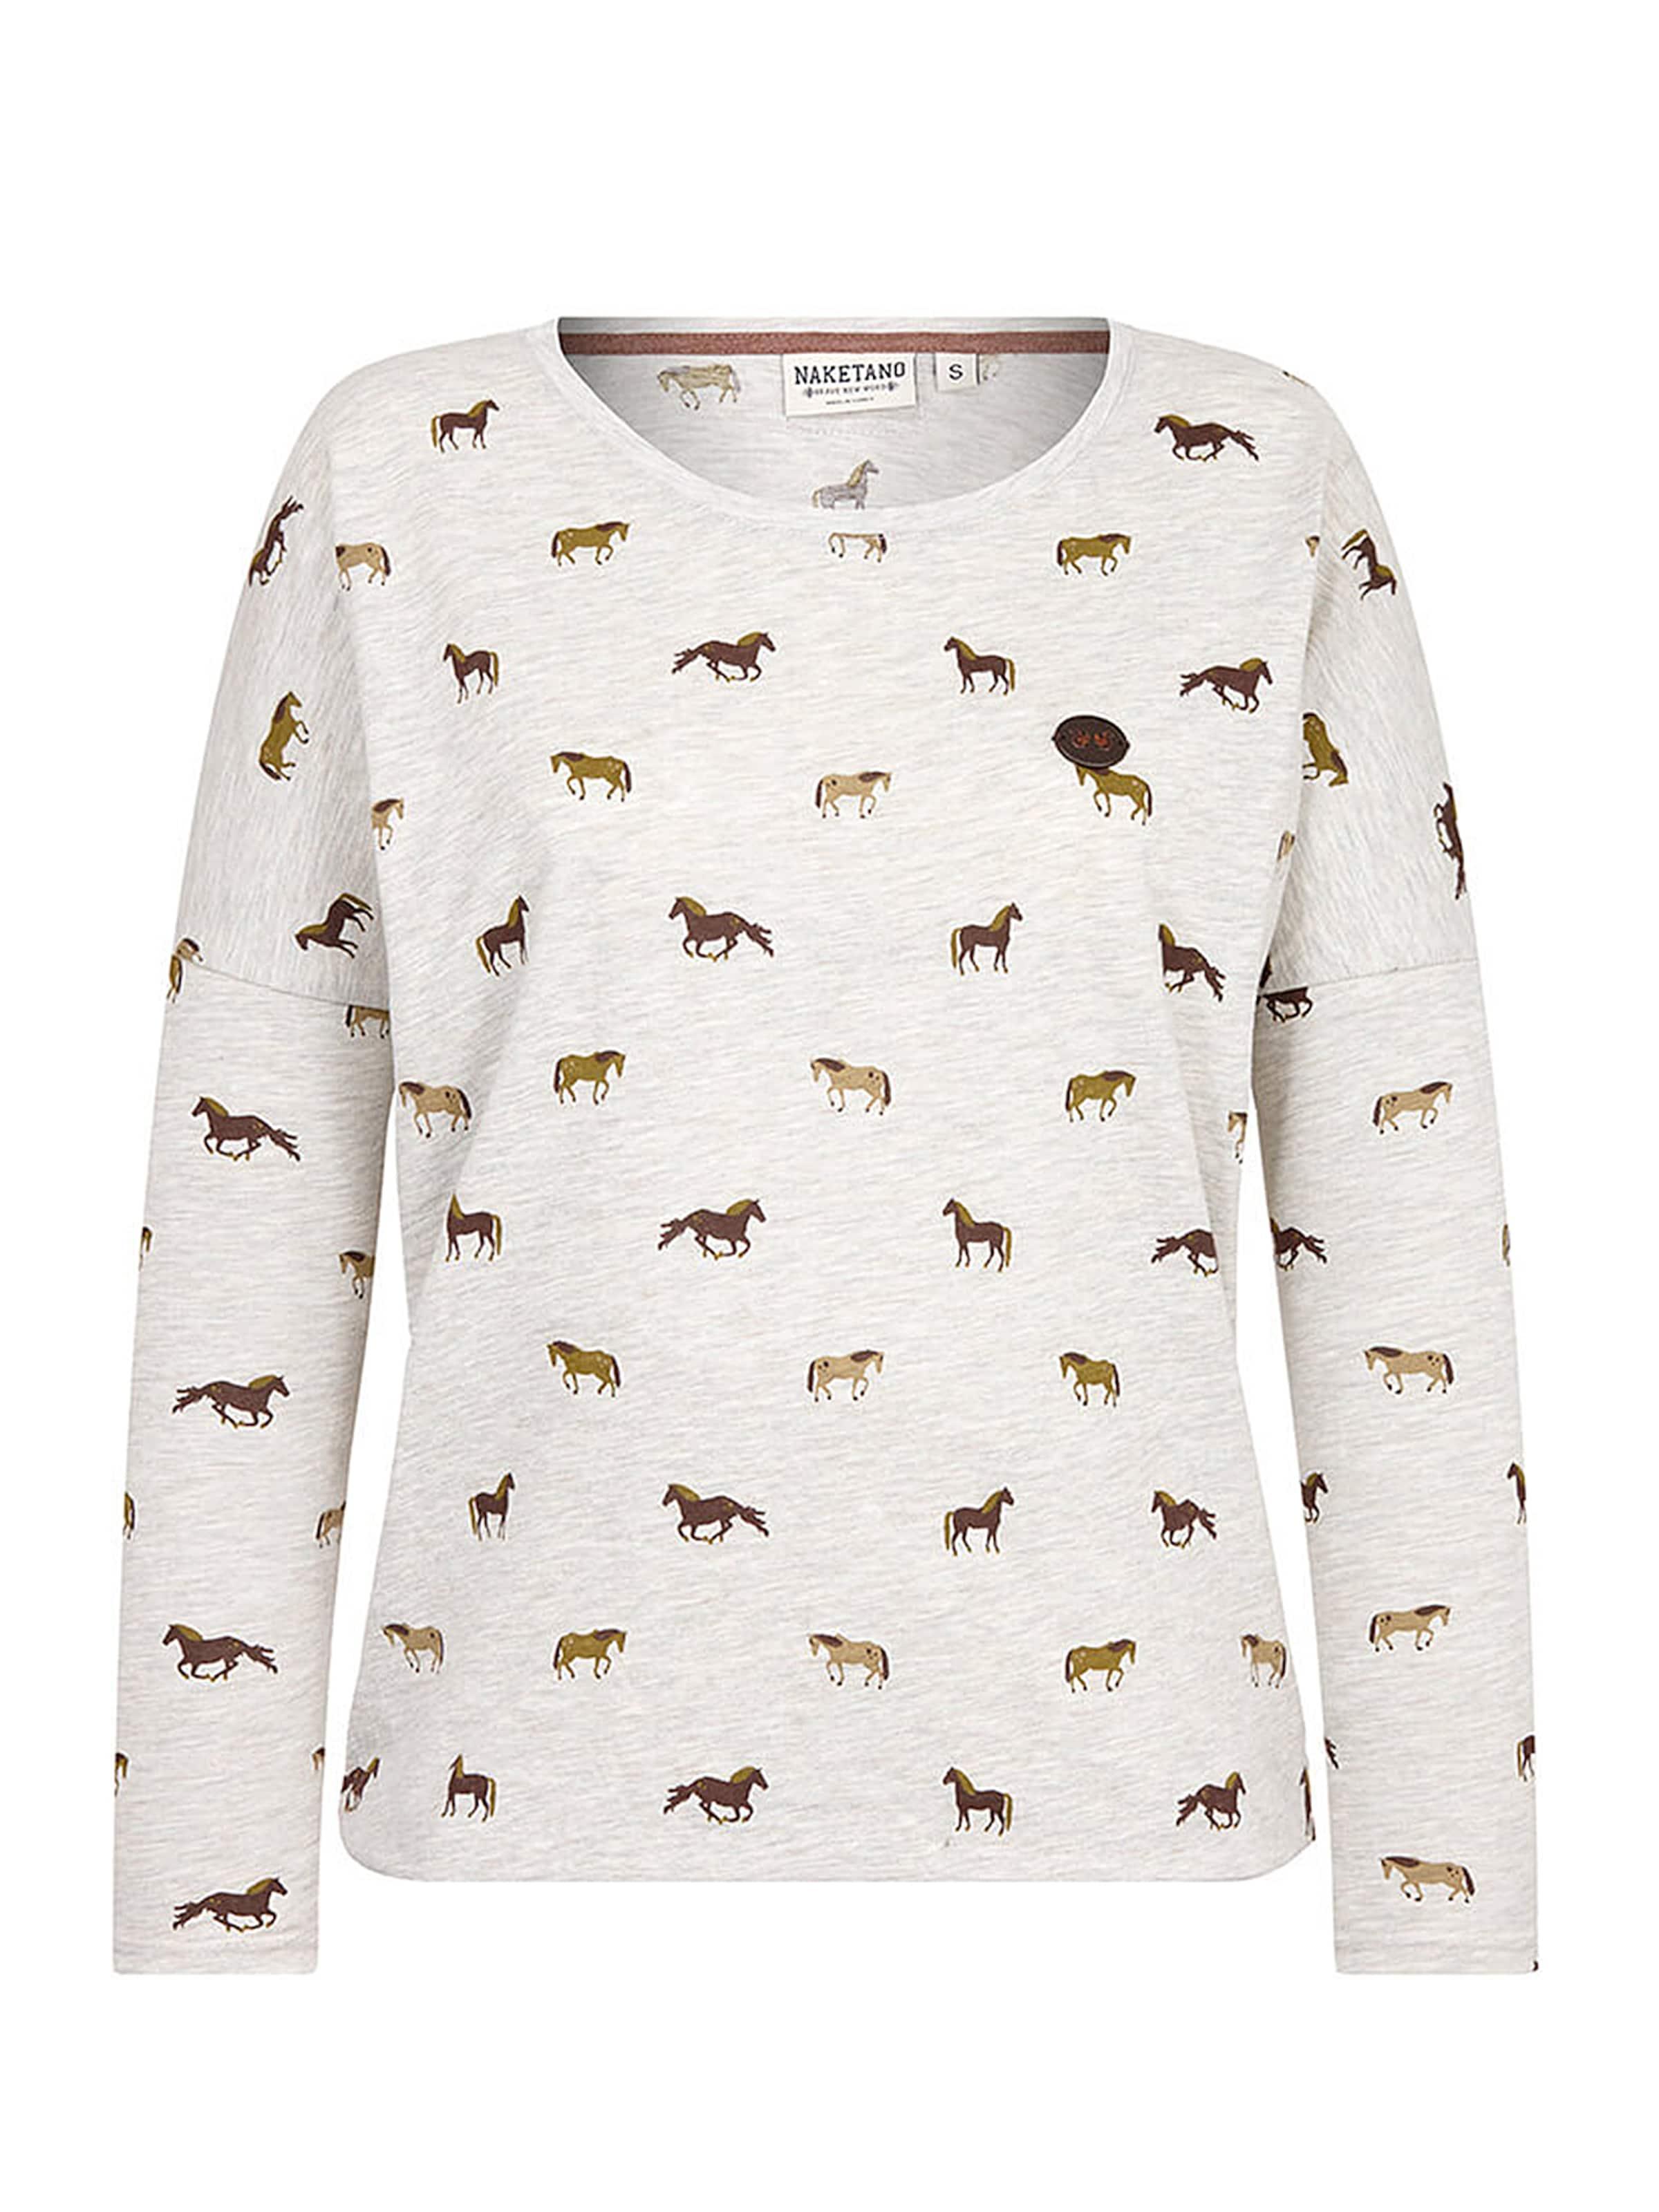 Badehose' En Blanc Naketano 'unterhose T Marron BeigeFoncé Cassé shirt LUSpGVqzM